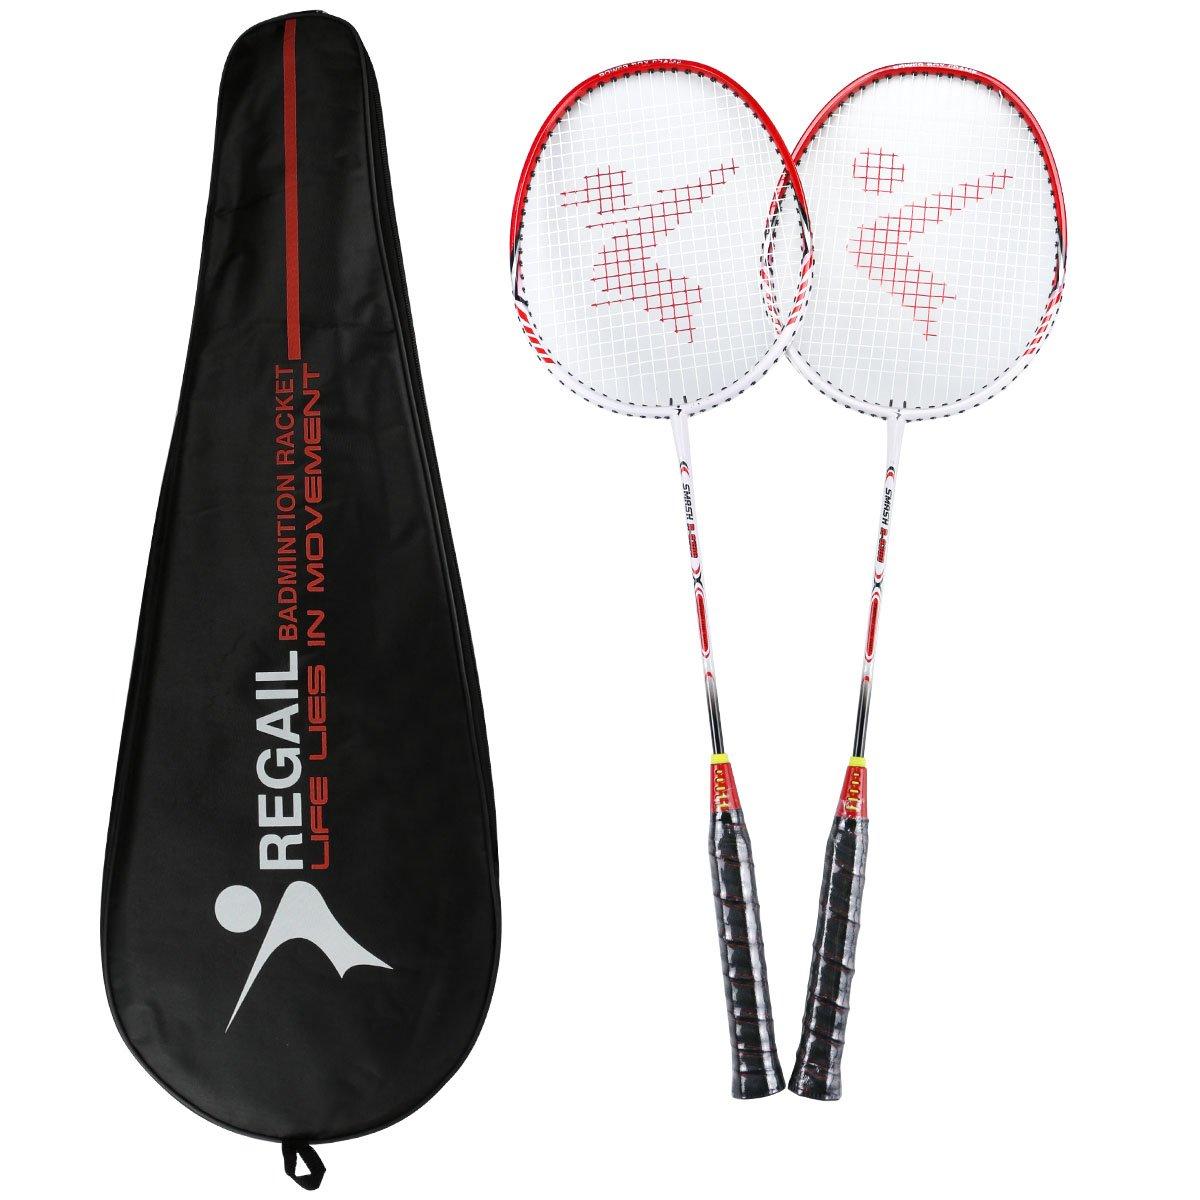 Philonext 2 Pack Badminton Rackets, Carbon Alloy Lightweight Sports Outdoor Badminton Racquet, 2 Player Badminton Practice Racquet Set Including 2 Rackets/1 Carrying Bag PhilonextOfficial